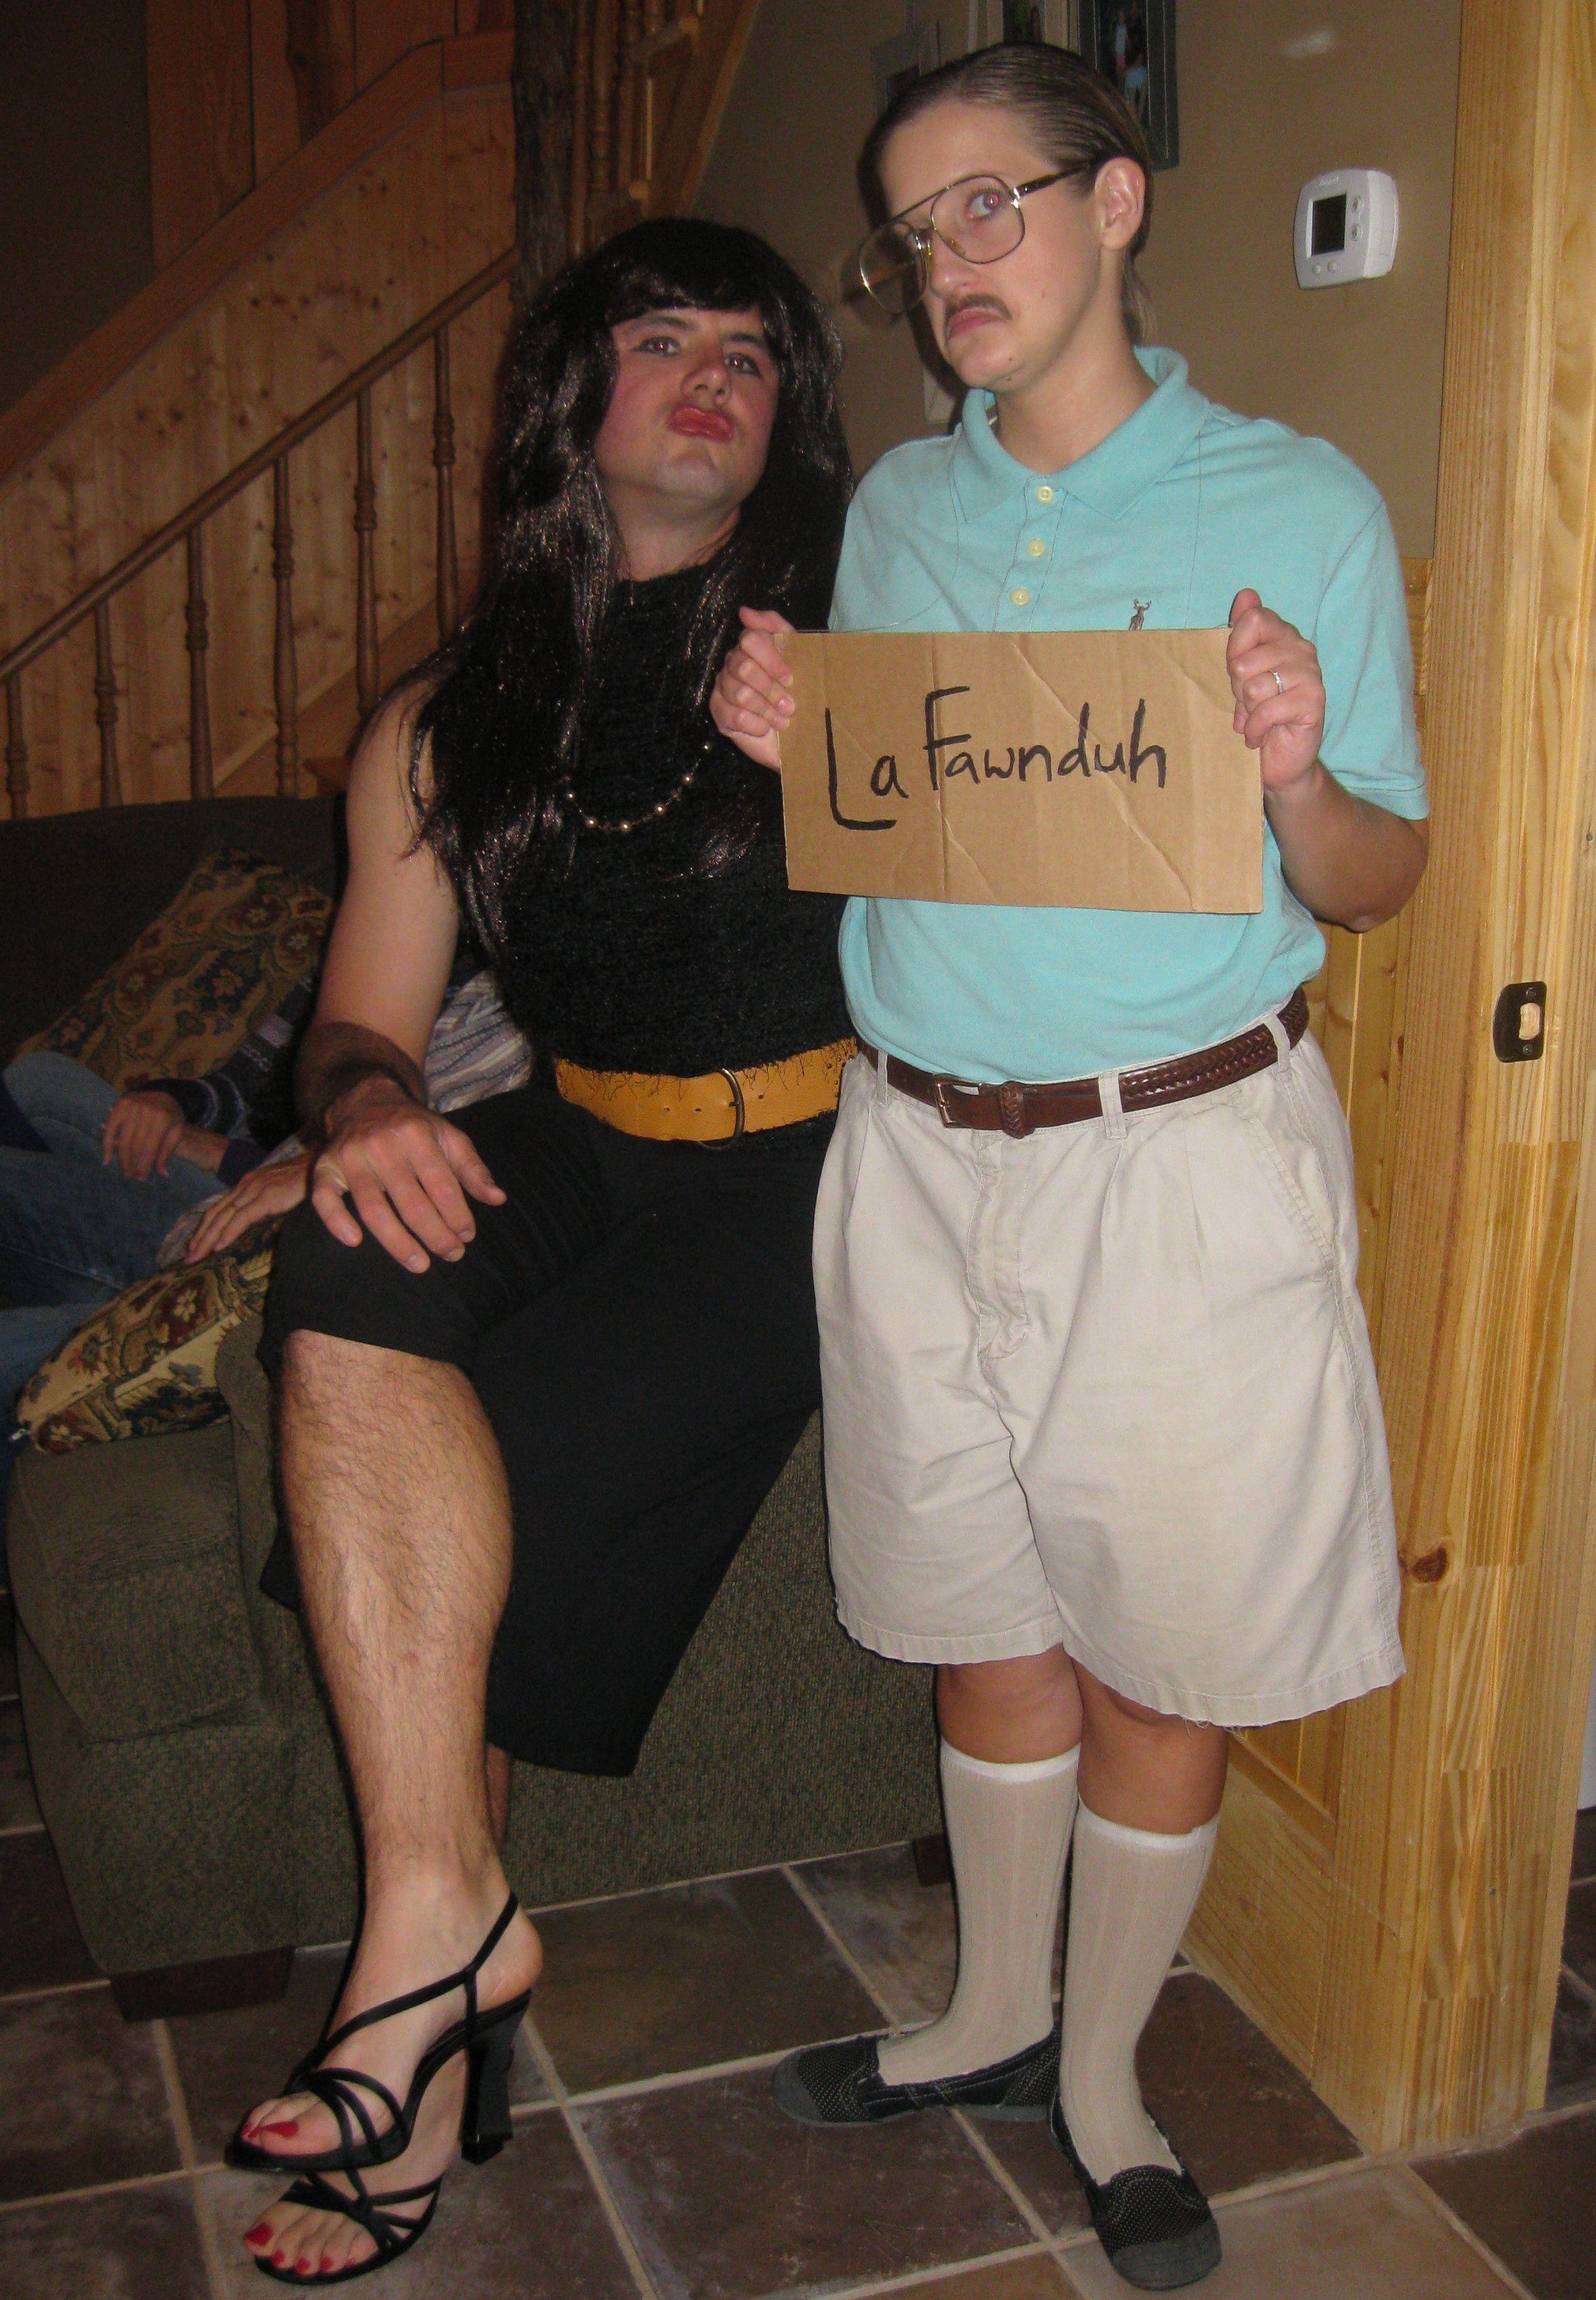 funny halloween costume: kip and lafawnduh from napoleon dynamite